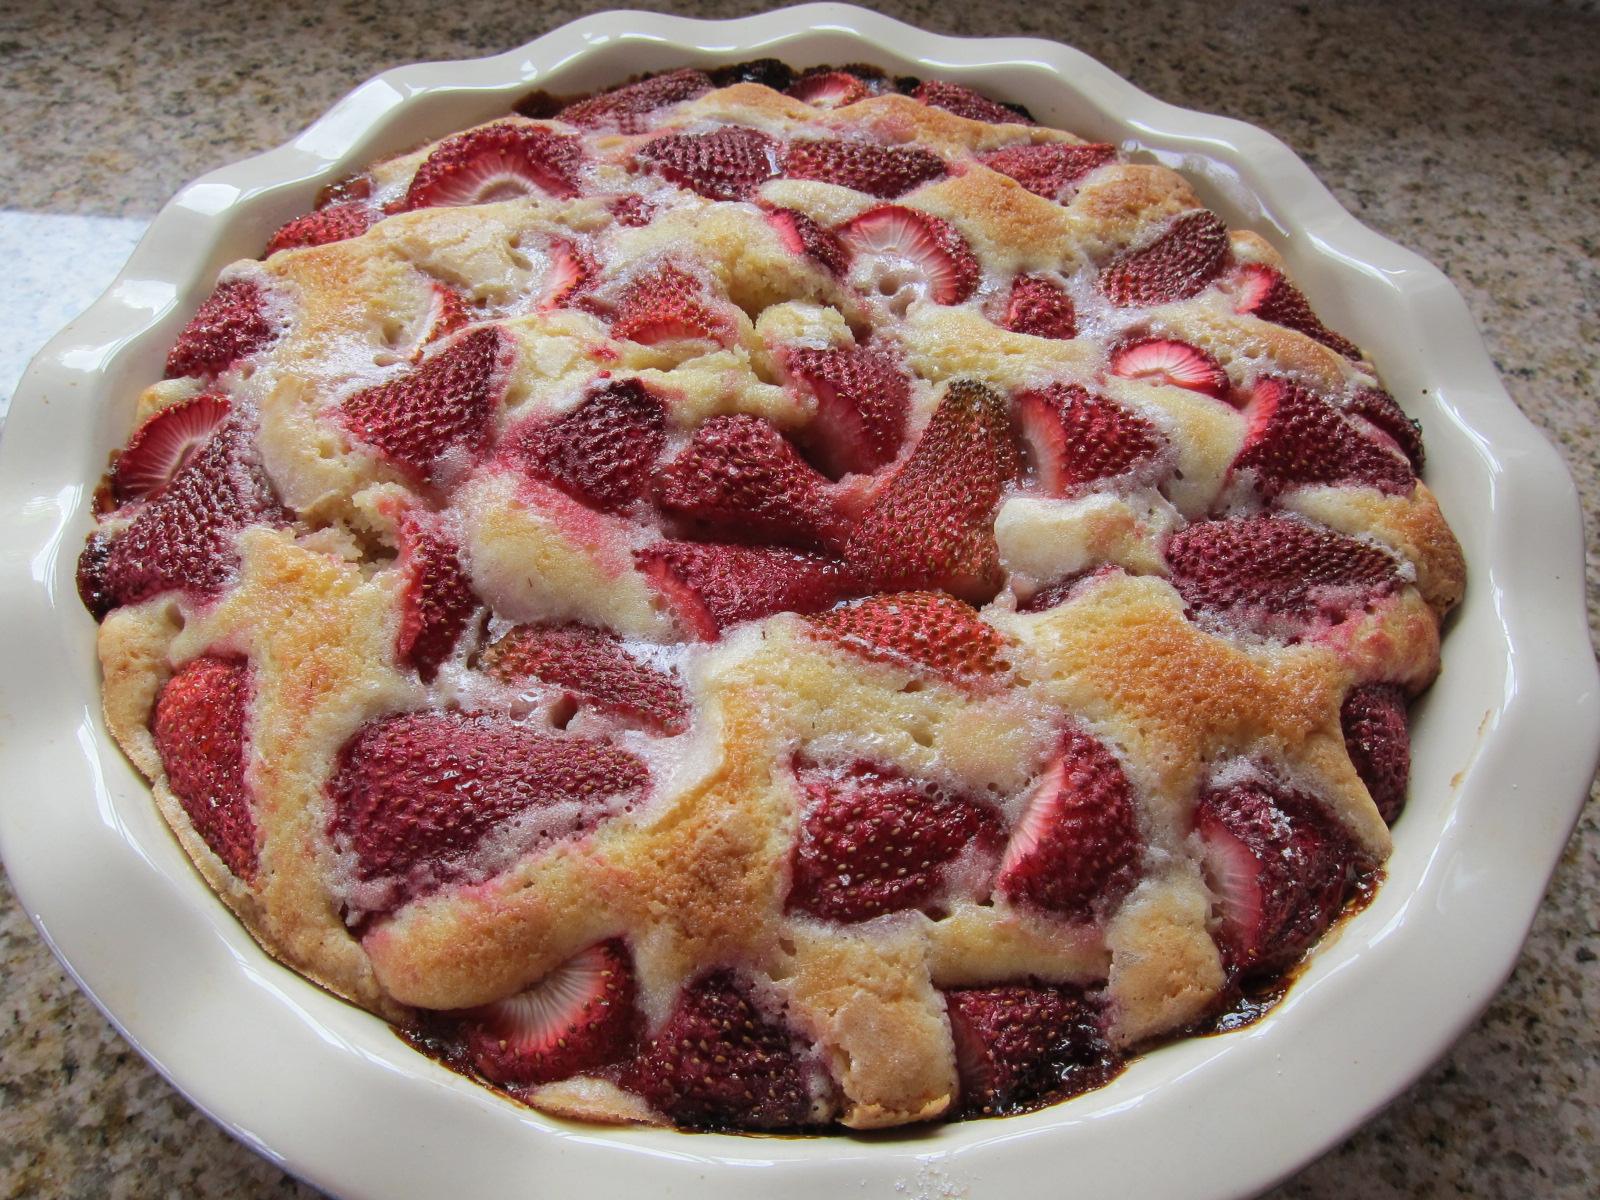 To celebrate Memorial Day weekend, I'm sharing one of my favorite summer dessert recipes — Smitten Kitchen's Strawberry Summer Cake.